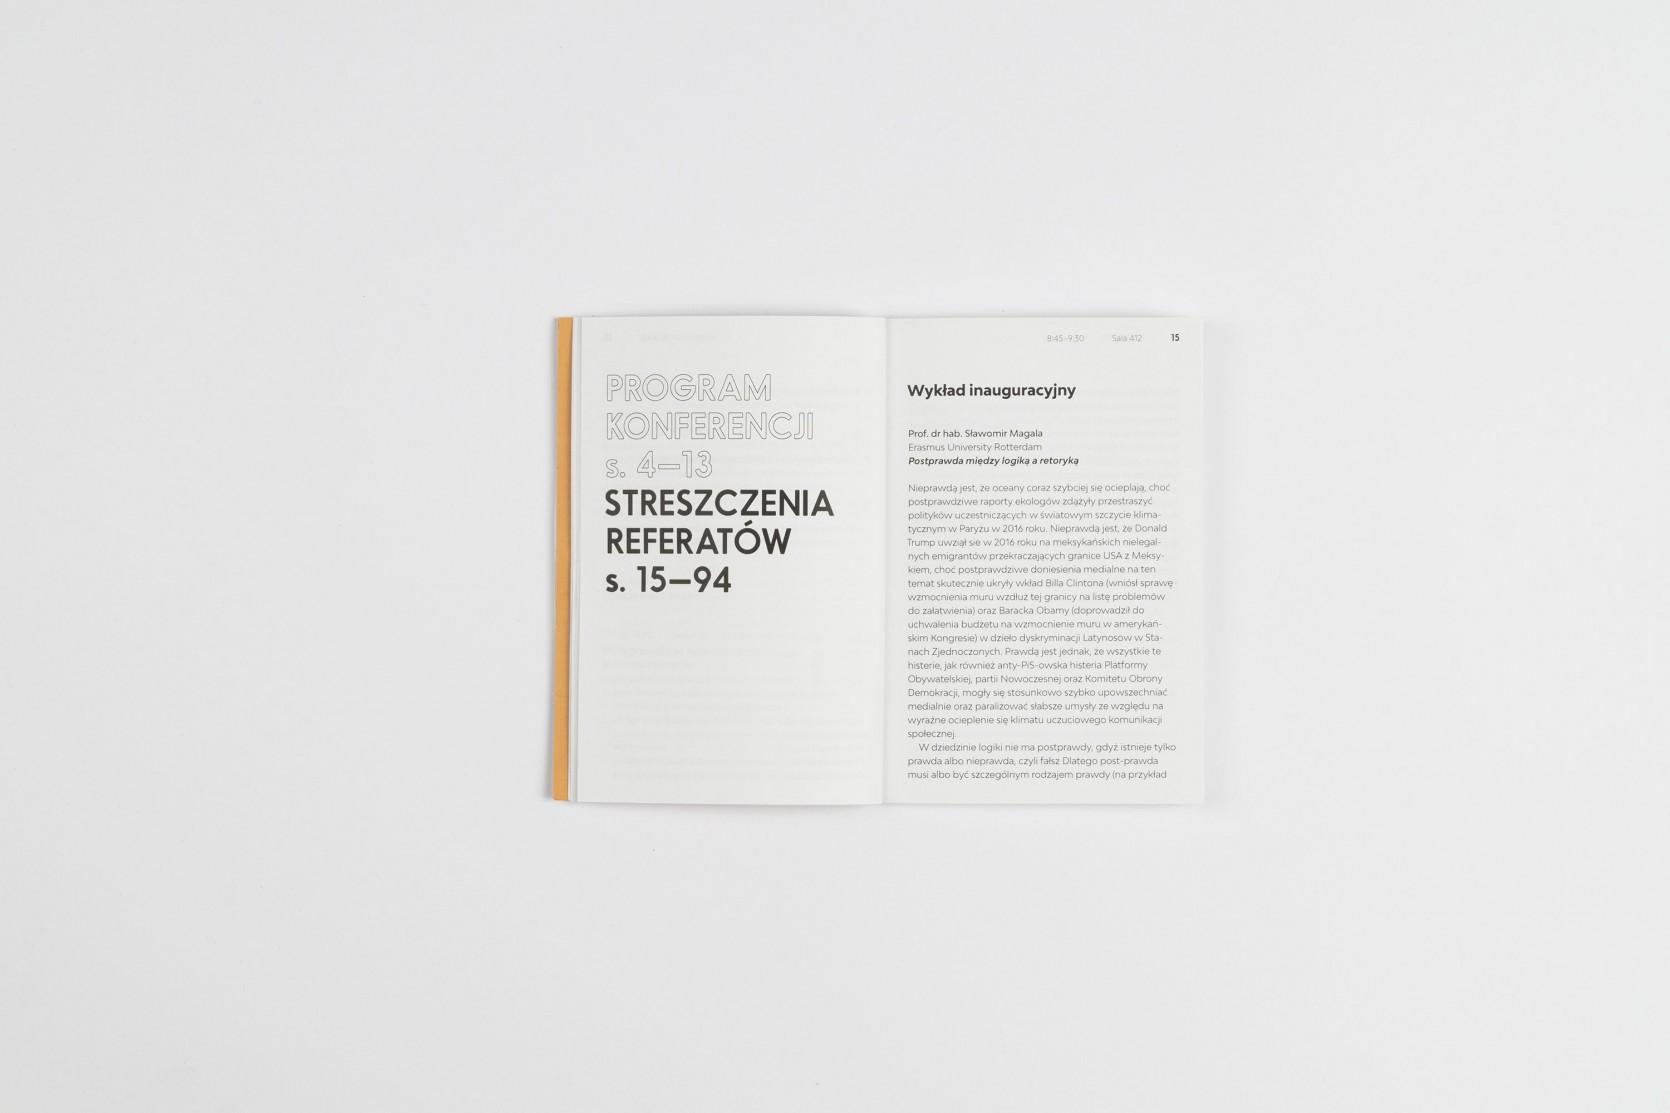 Programme — topview 5